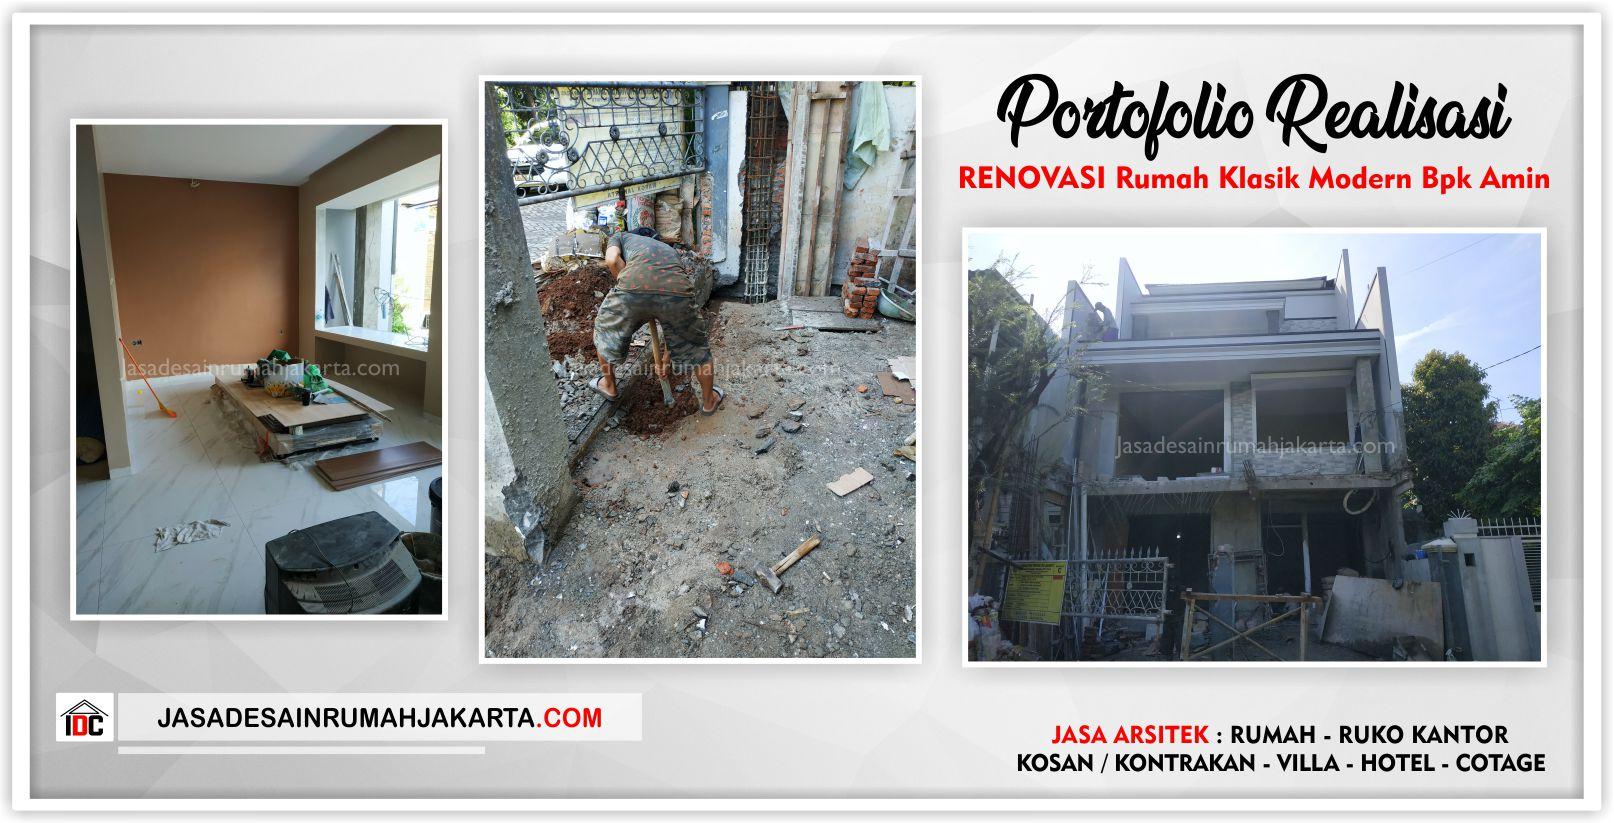 Realisasi Kunjungan V Proyek Renovasi Rumah Klasik Modern 3 Lantai Bpk Amin Jakarta Barat Jasa Desain Rumah Jakarta Jasa Gambar Rumah Jasa Arsitek Rumah Jasa Interior Rumah Jasa Renovasi Rumah